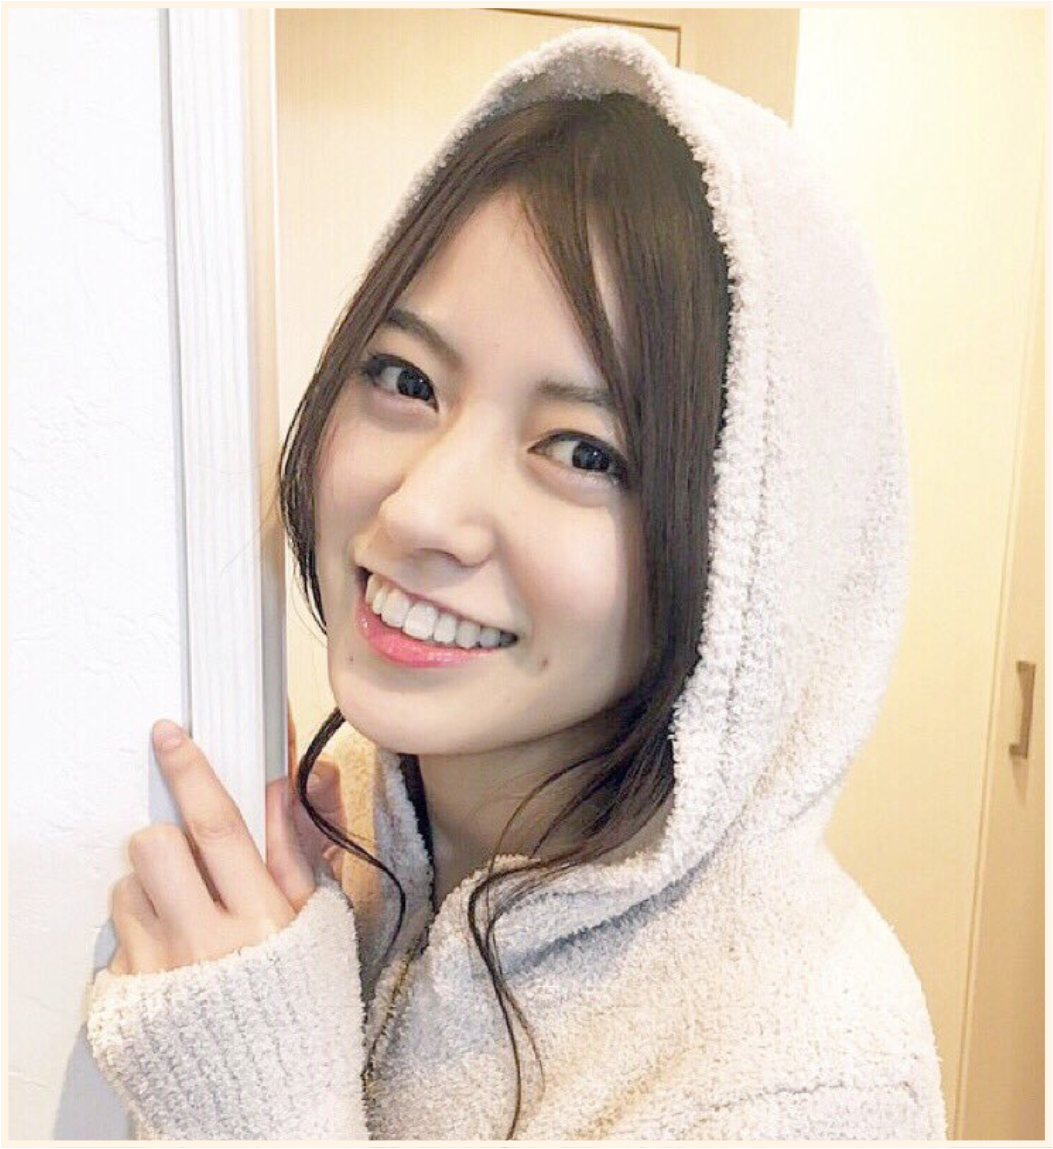 Shinbo_06_pic